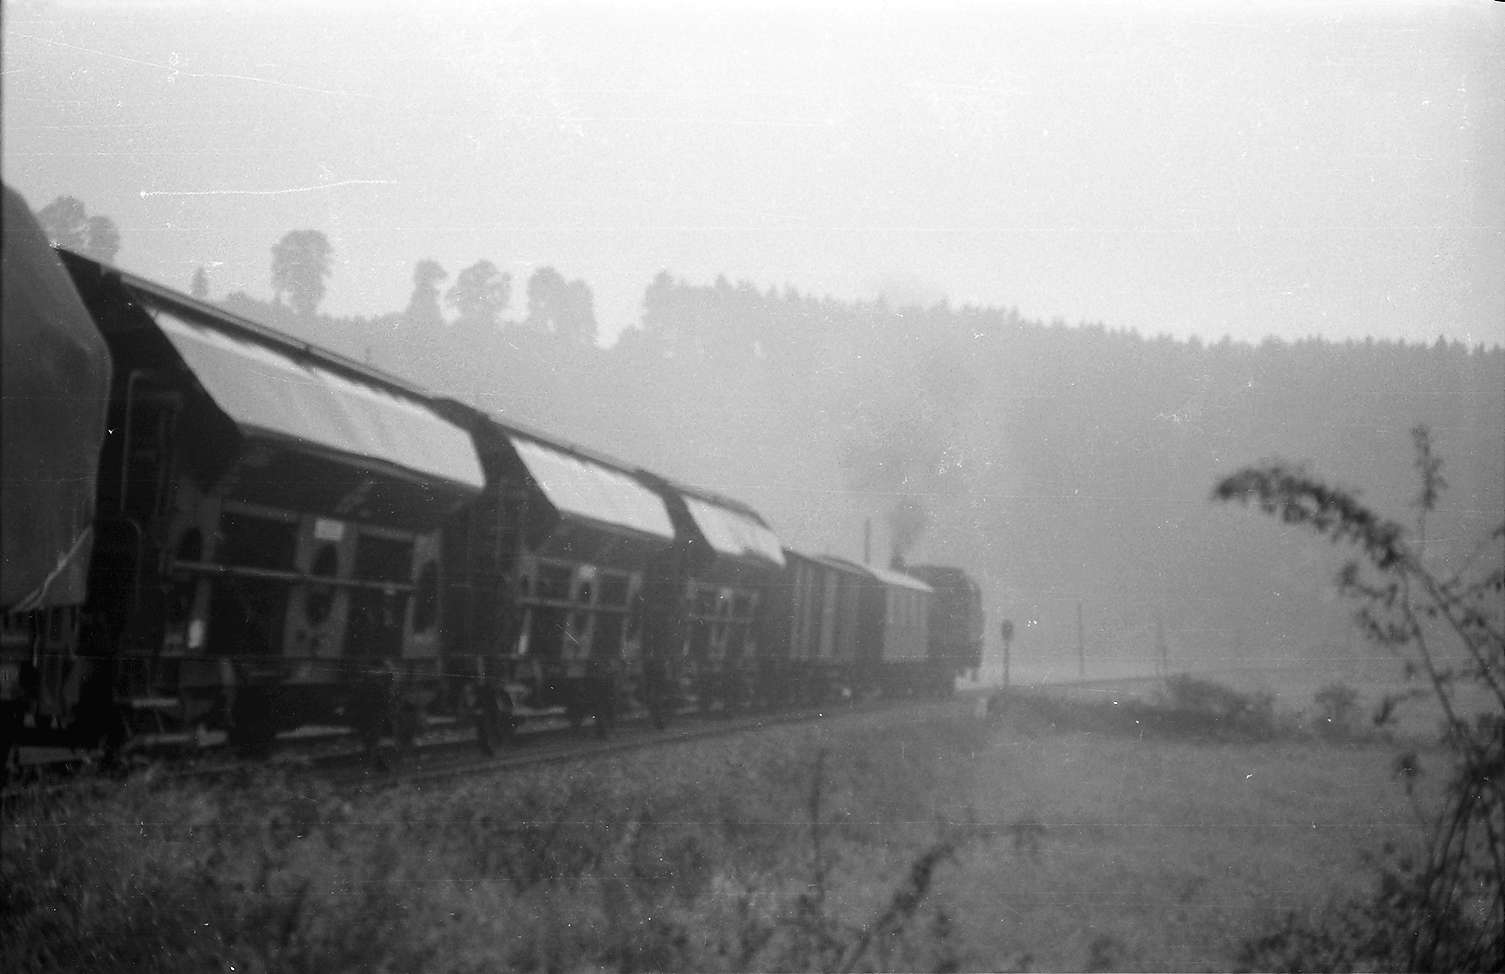 Lok 141, Trillfingen, Eyachtal Richtung Bad Imnau, Bild 1